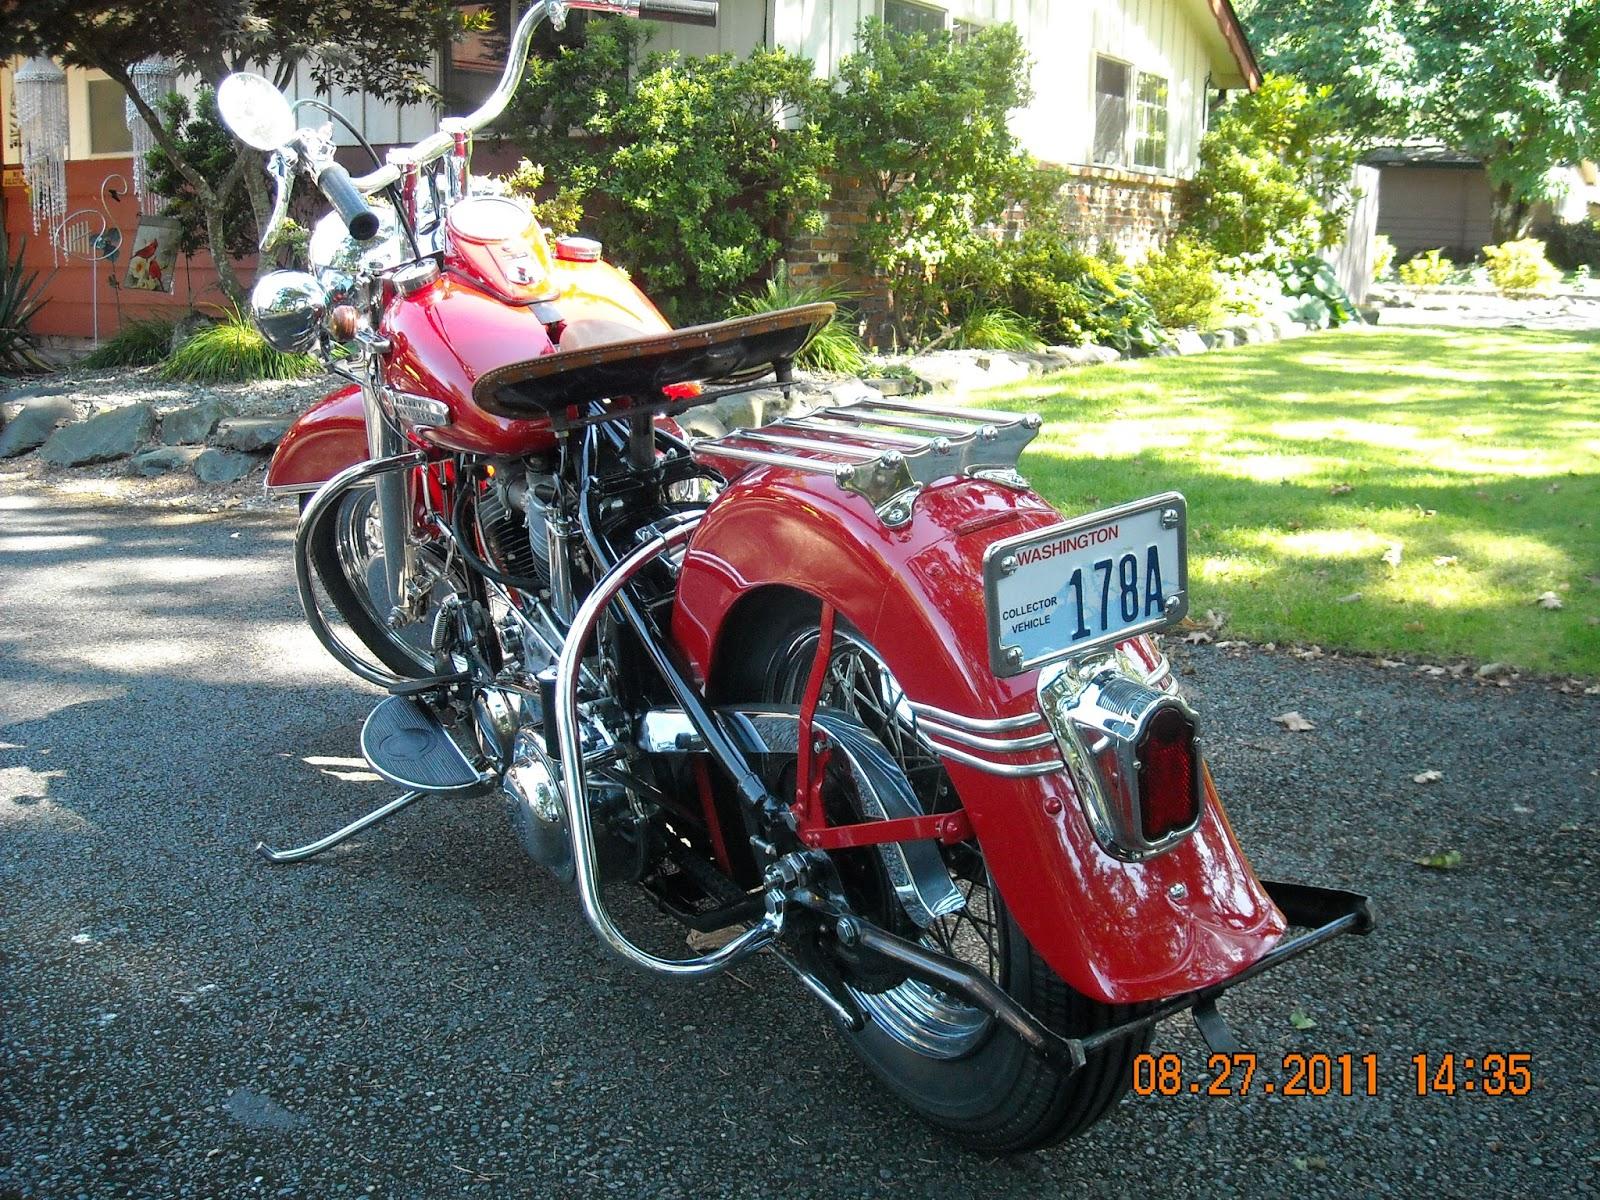 Old Harley Davidson: Harley Davidson Classic: Classic Harley Davidson 1950s